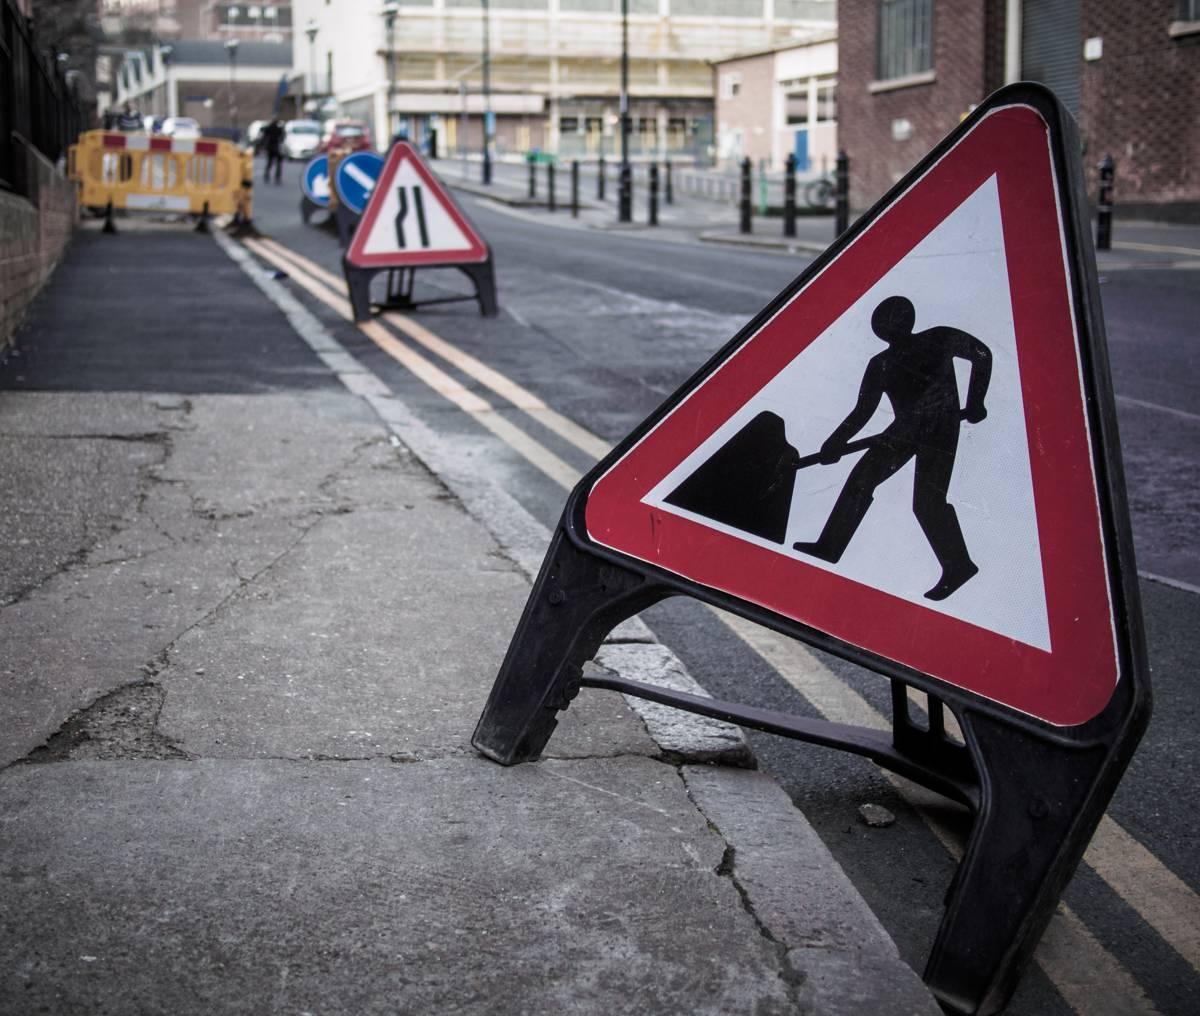 United Kingdom announces details of more than £1.3 billion of road improvements